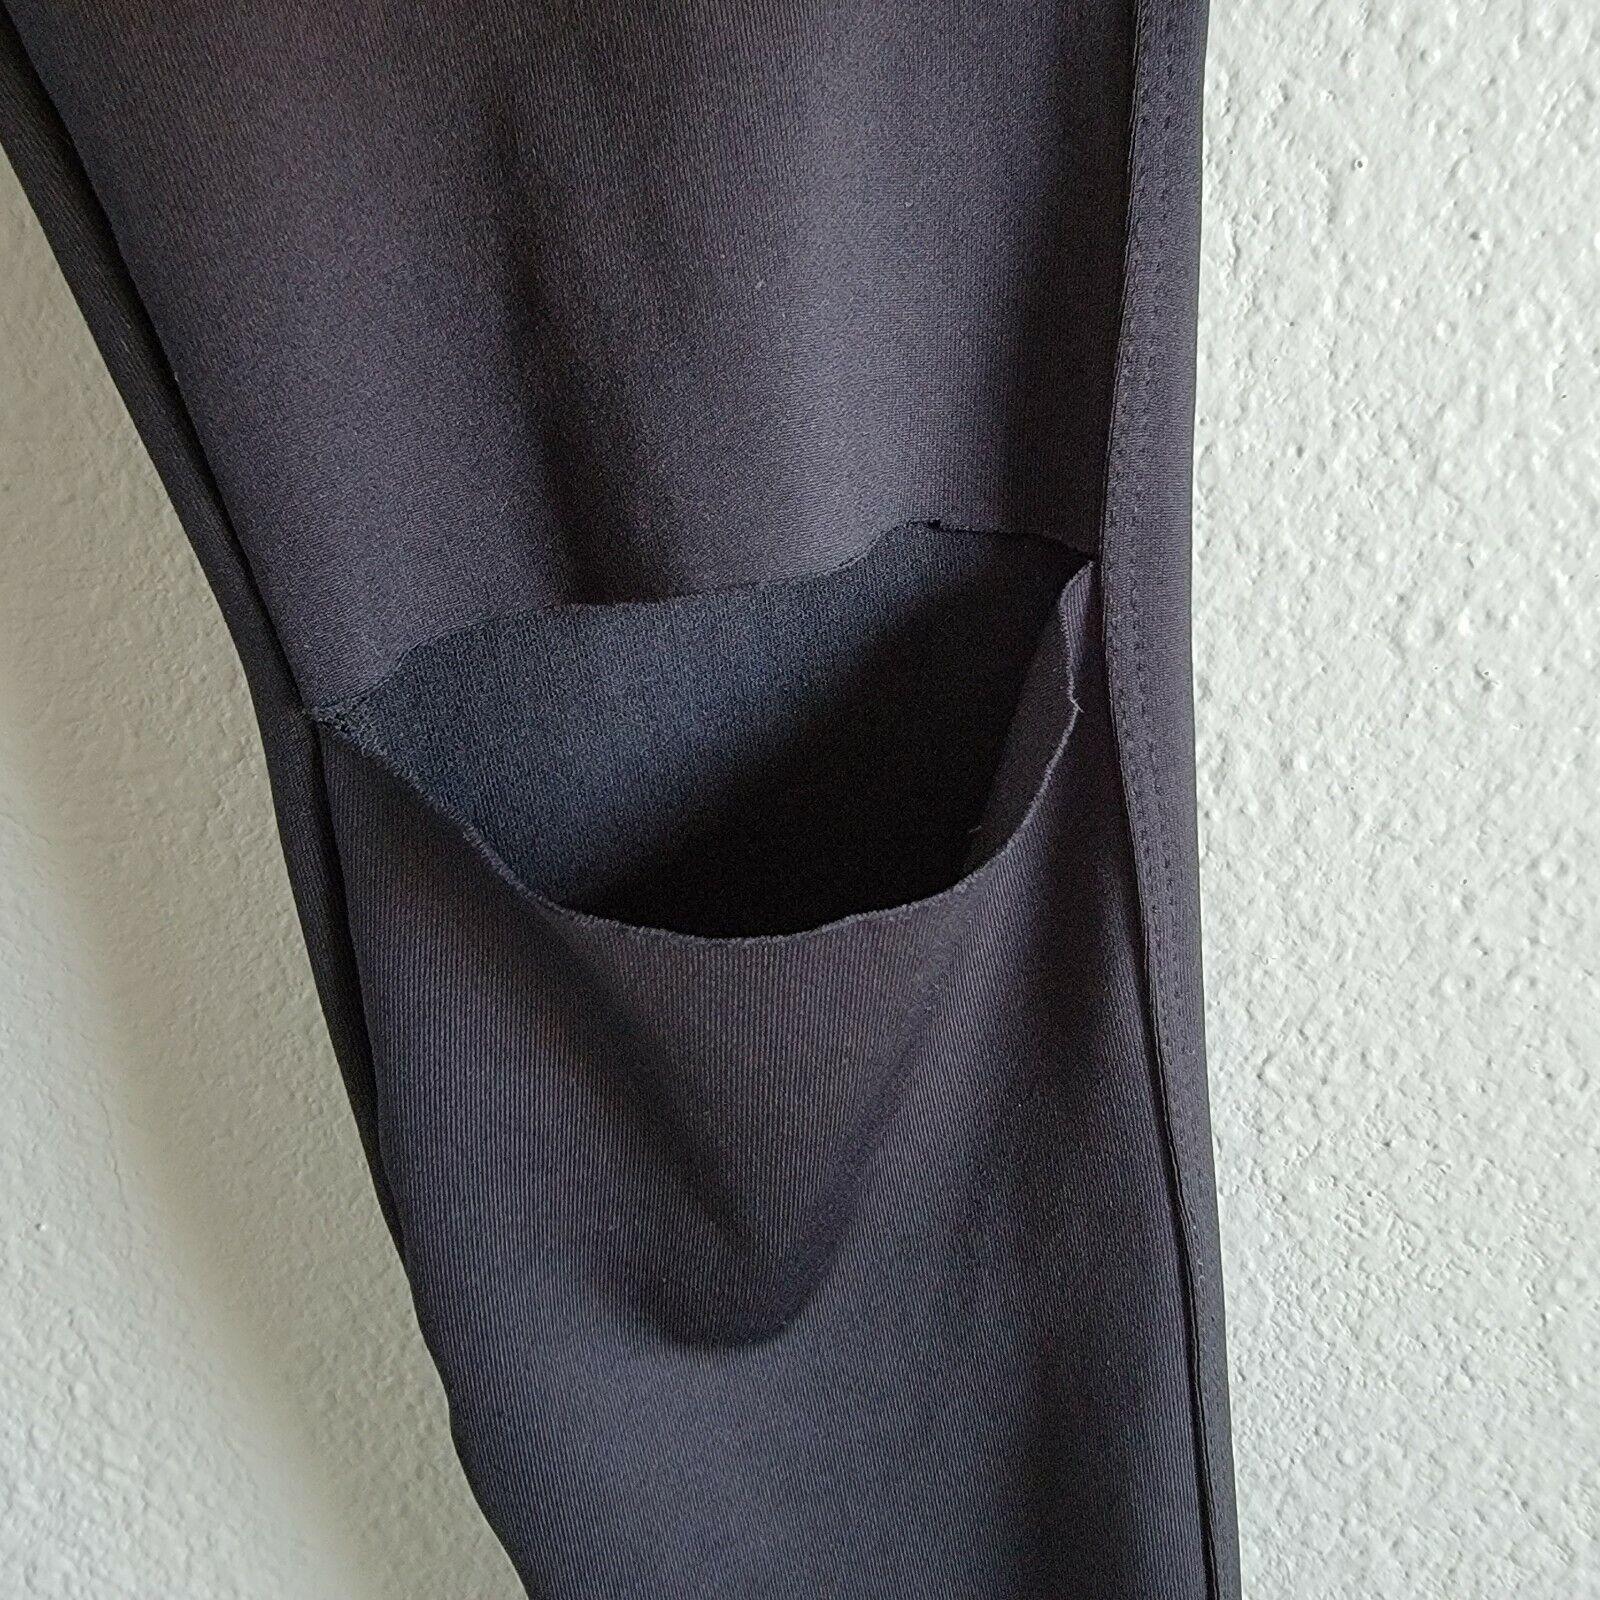 Olympia Activewear AJAX Full Lenght Black Jet Leg… - image 2